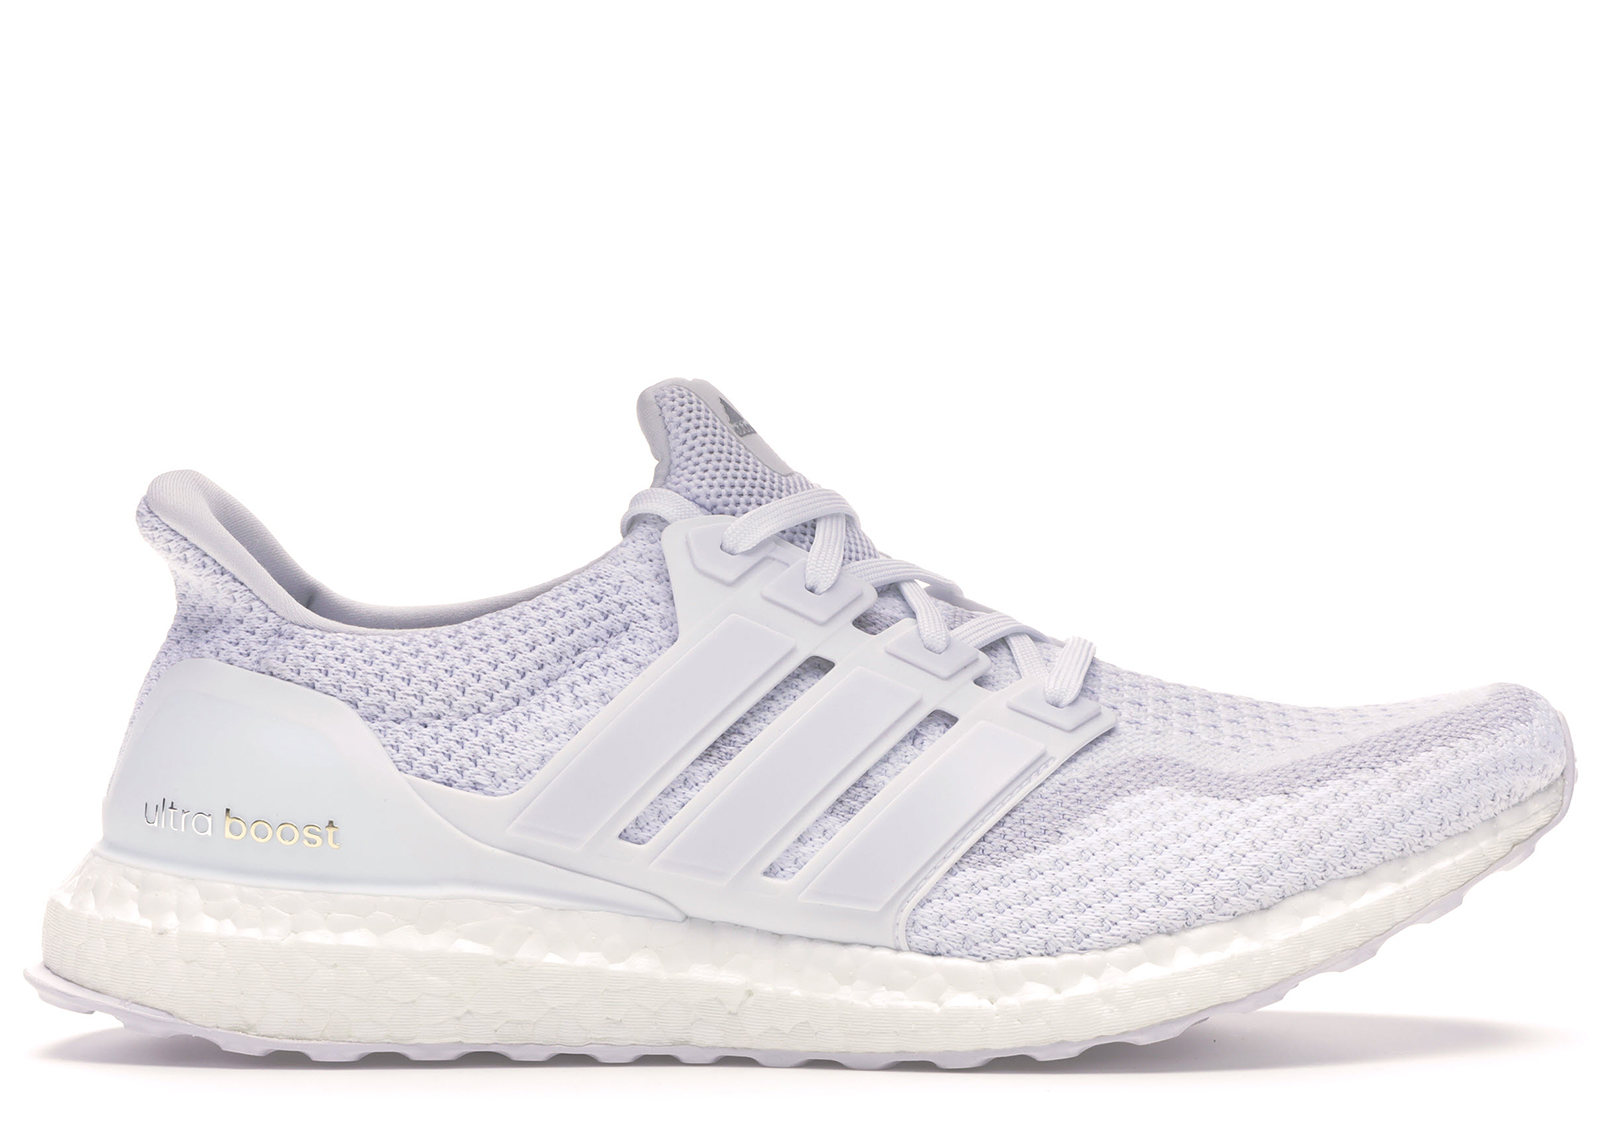 adidas Ultra Boost 2.0 Triple White